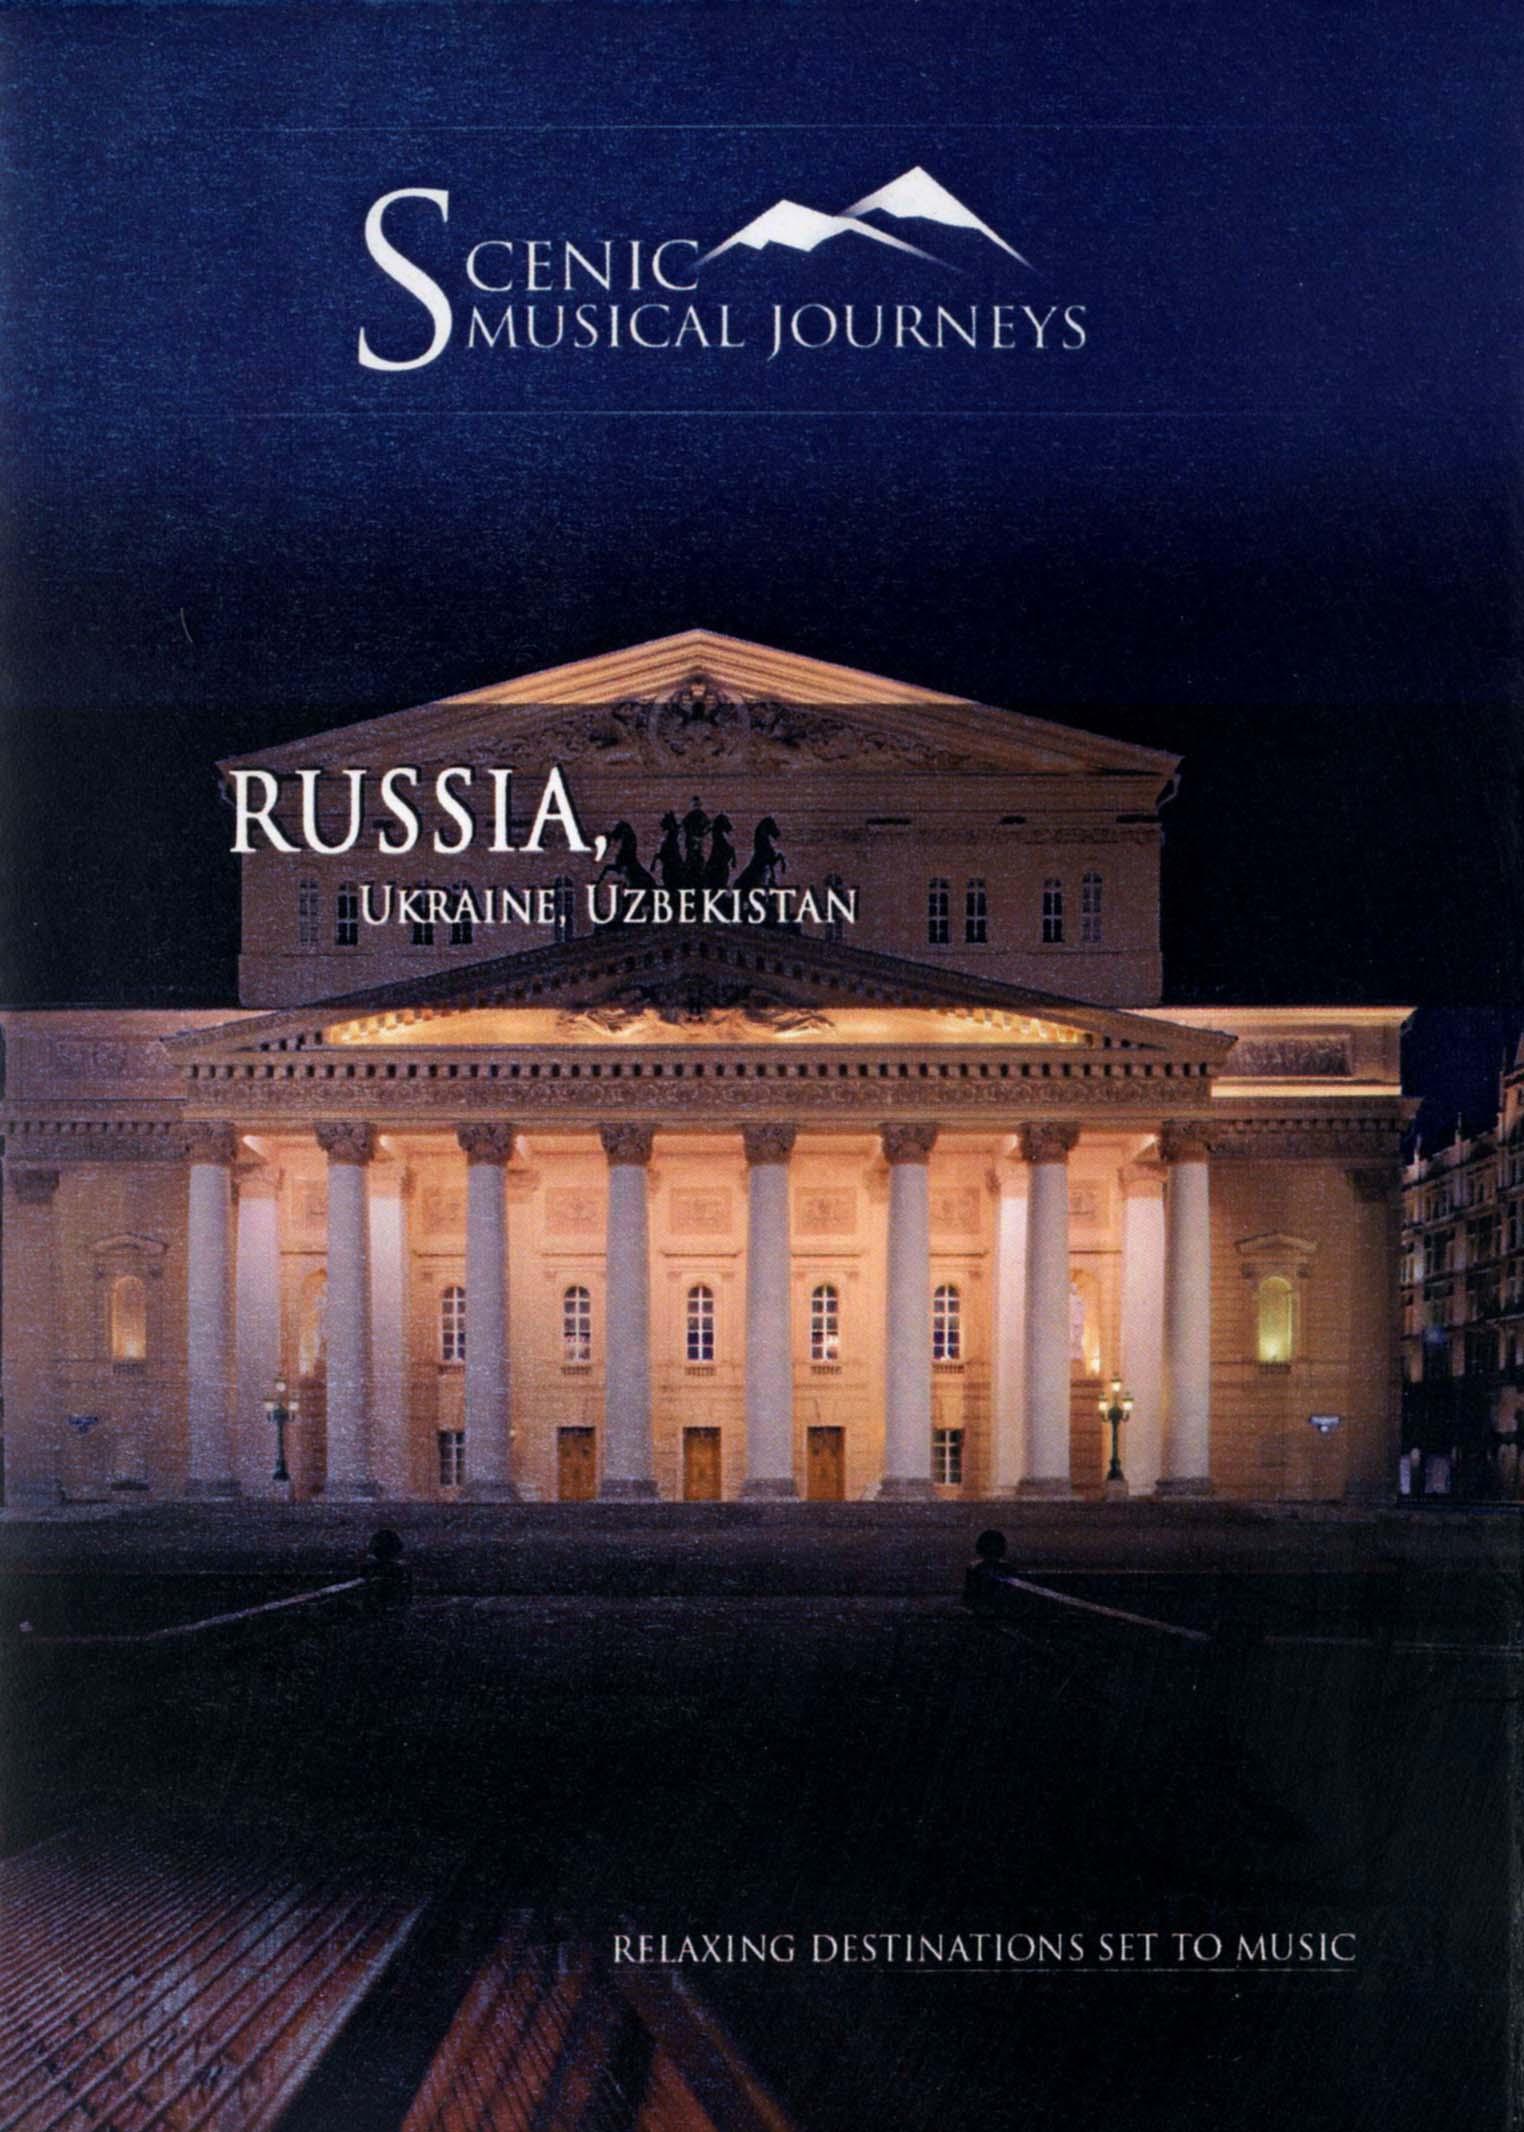 Scenic Musical Journeys: Russia, Ukraine, Uzbekistan